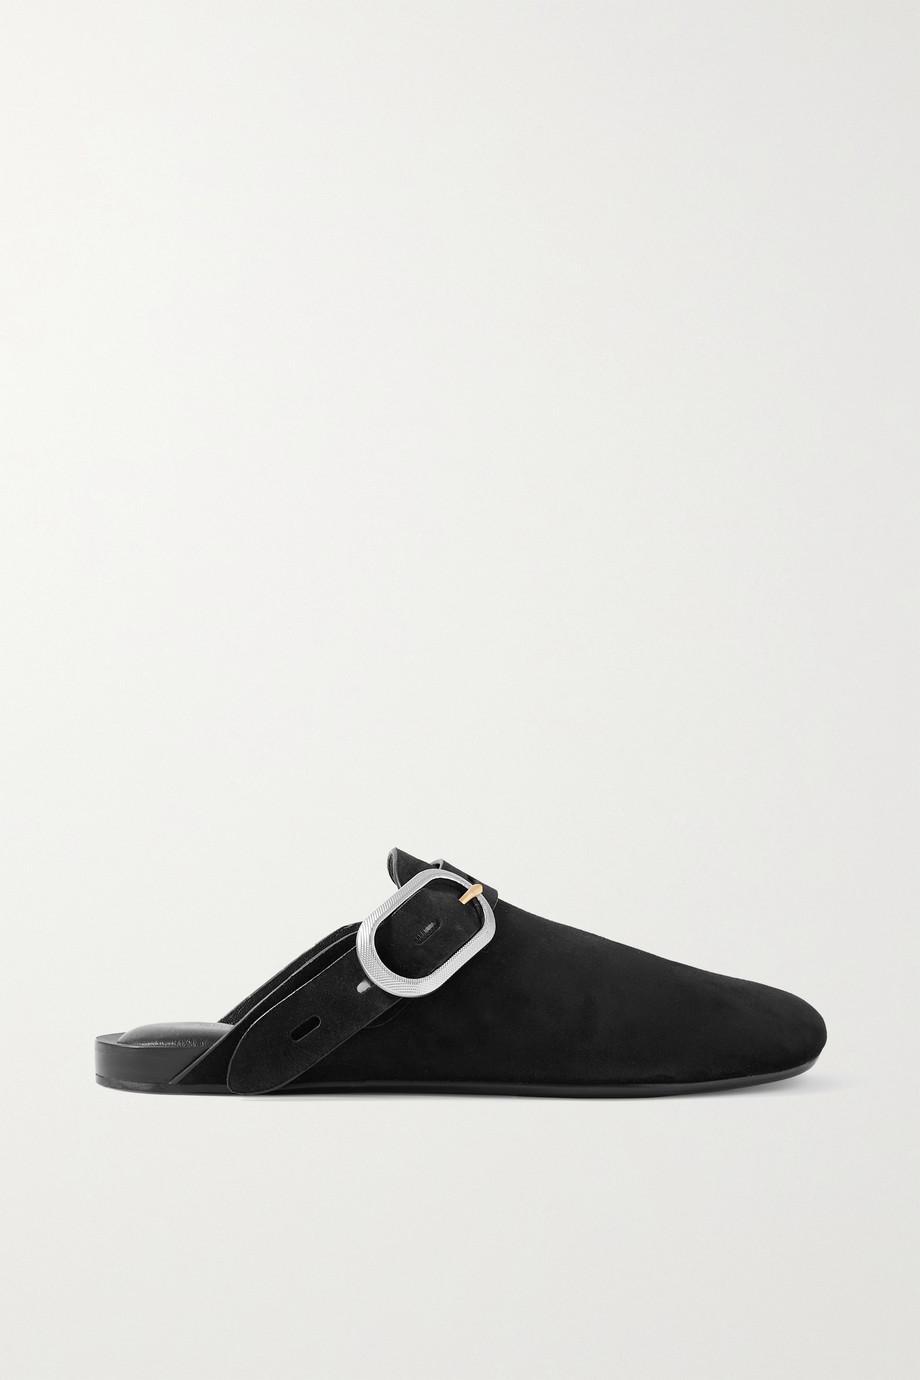 rag & bone Ansley buckled suede slippers